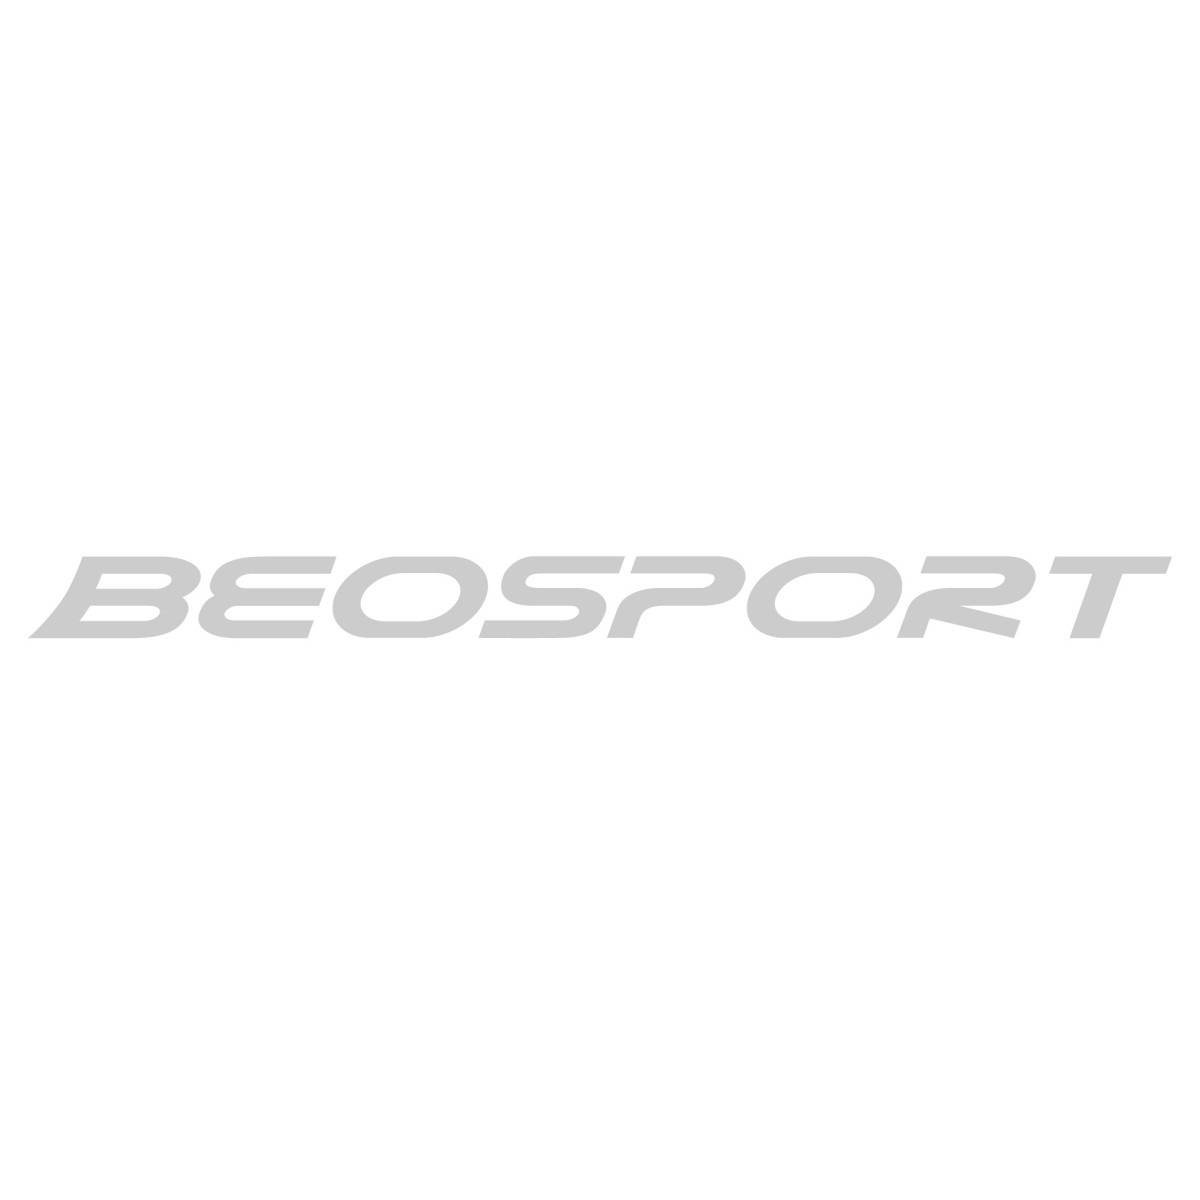 Wilson Pro Soft Overgrip 0.55mm teniski grip